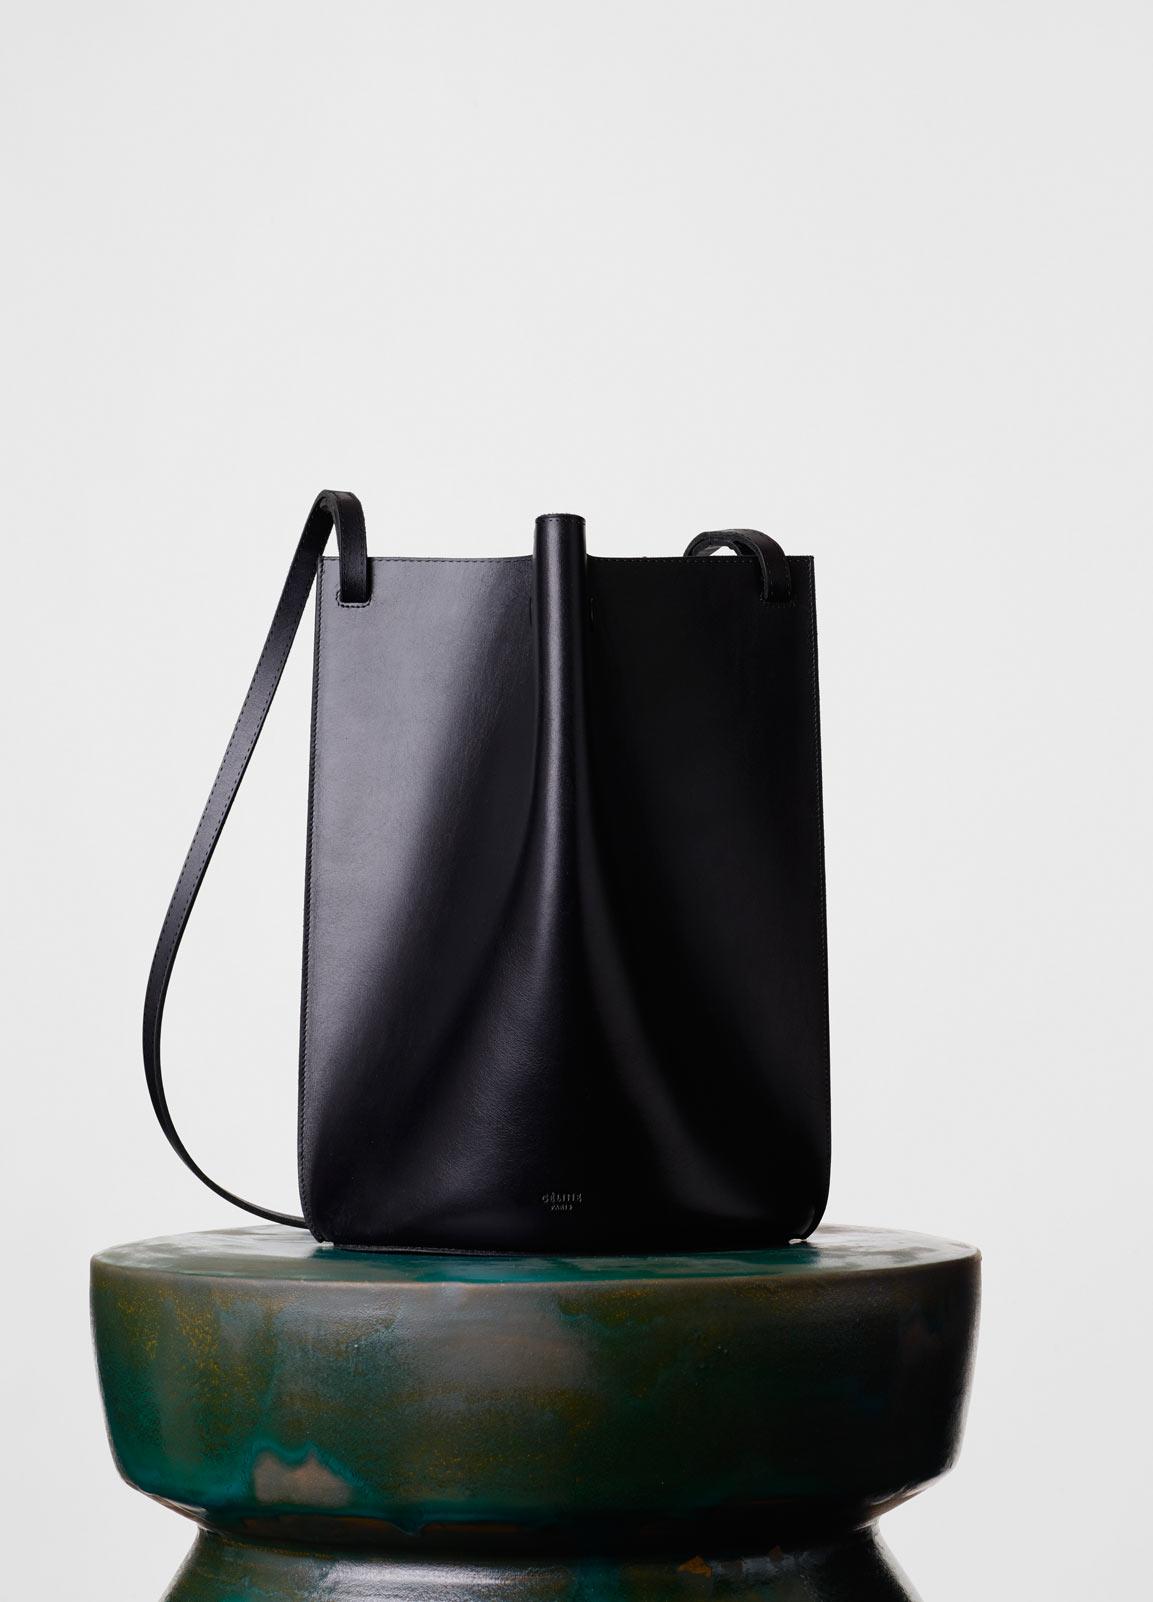 Celine 2015 Fall \u0026amp; Winter Bag Collection | Lollipuff